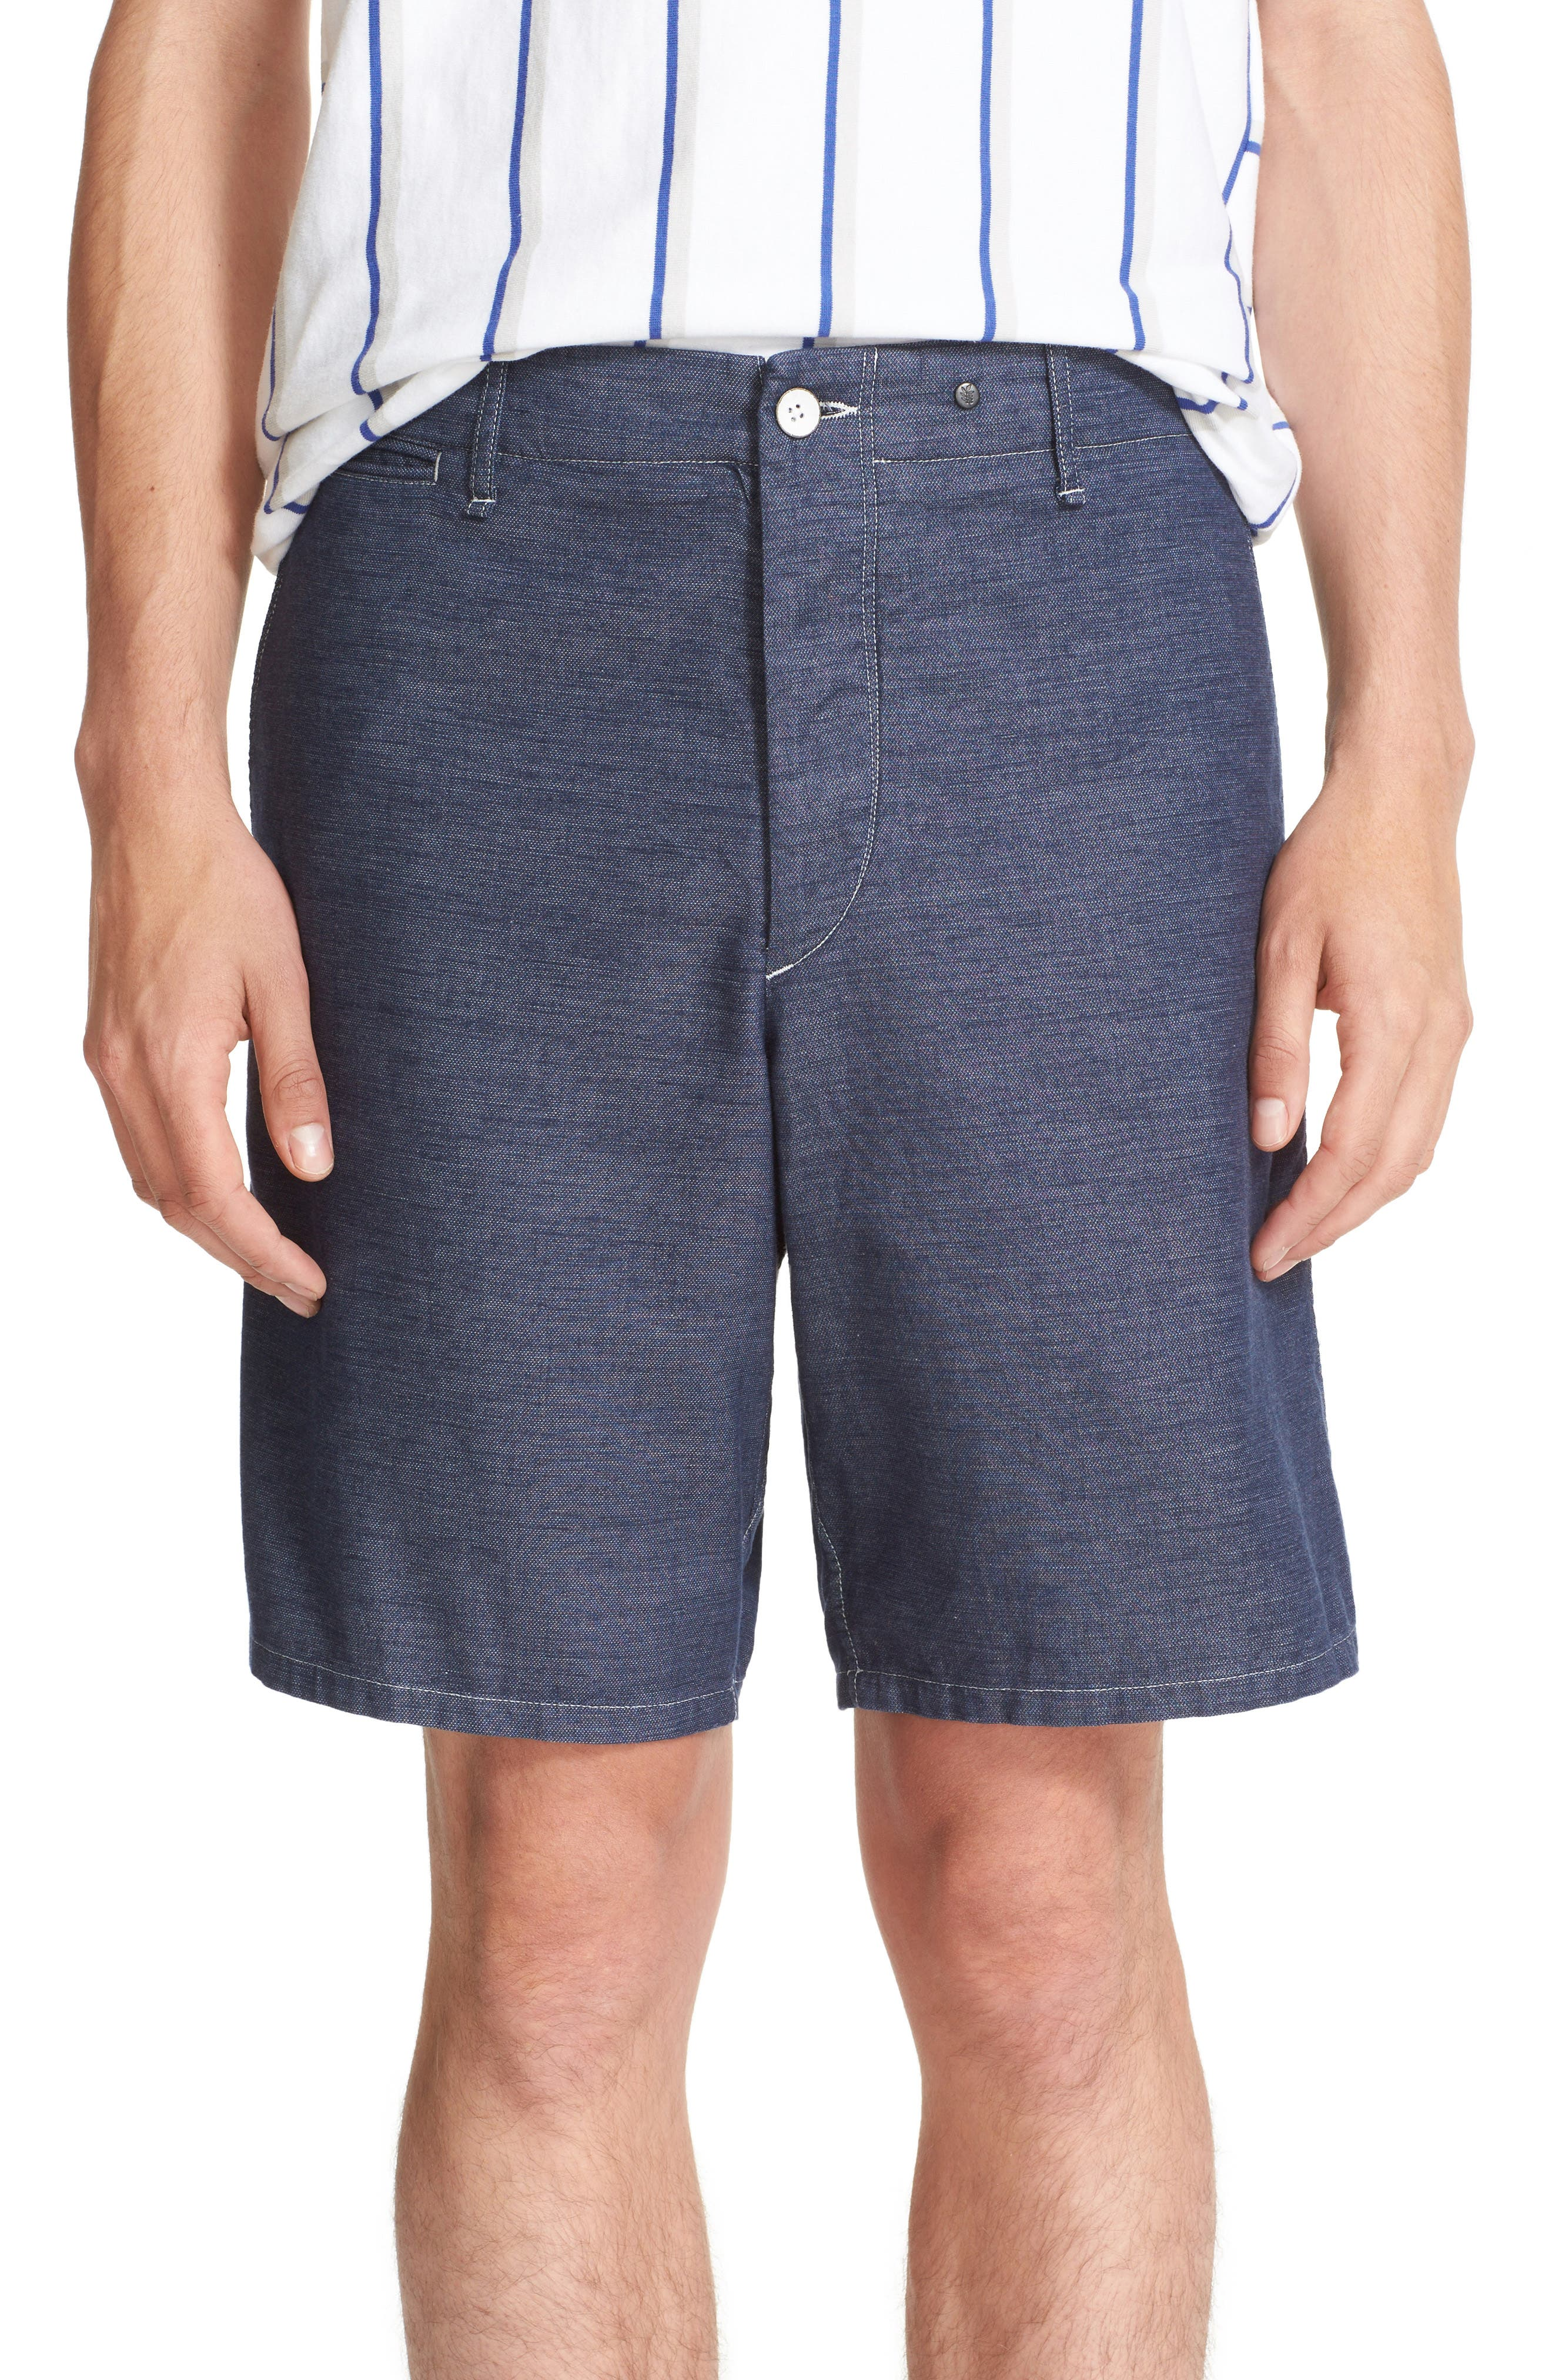 rag & bone Beach Fit II Cotton Shorts